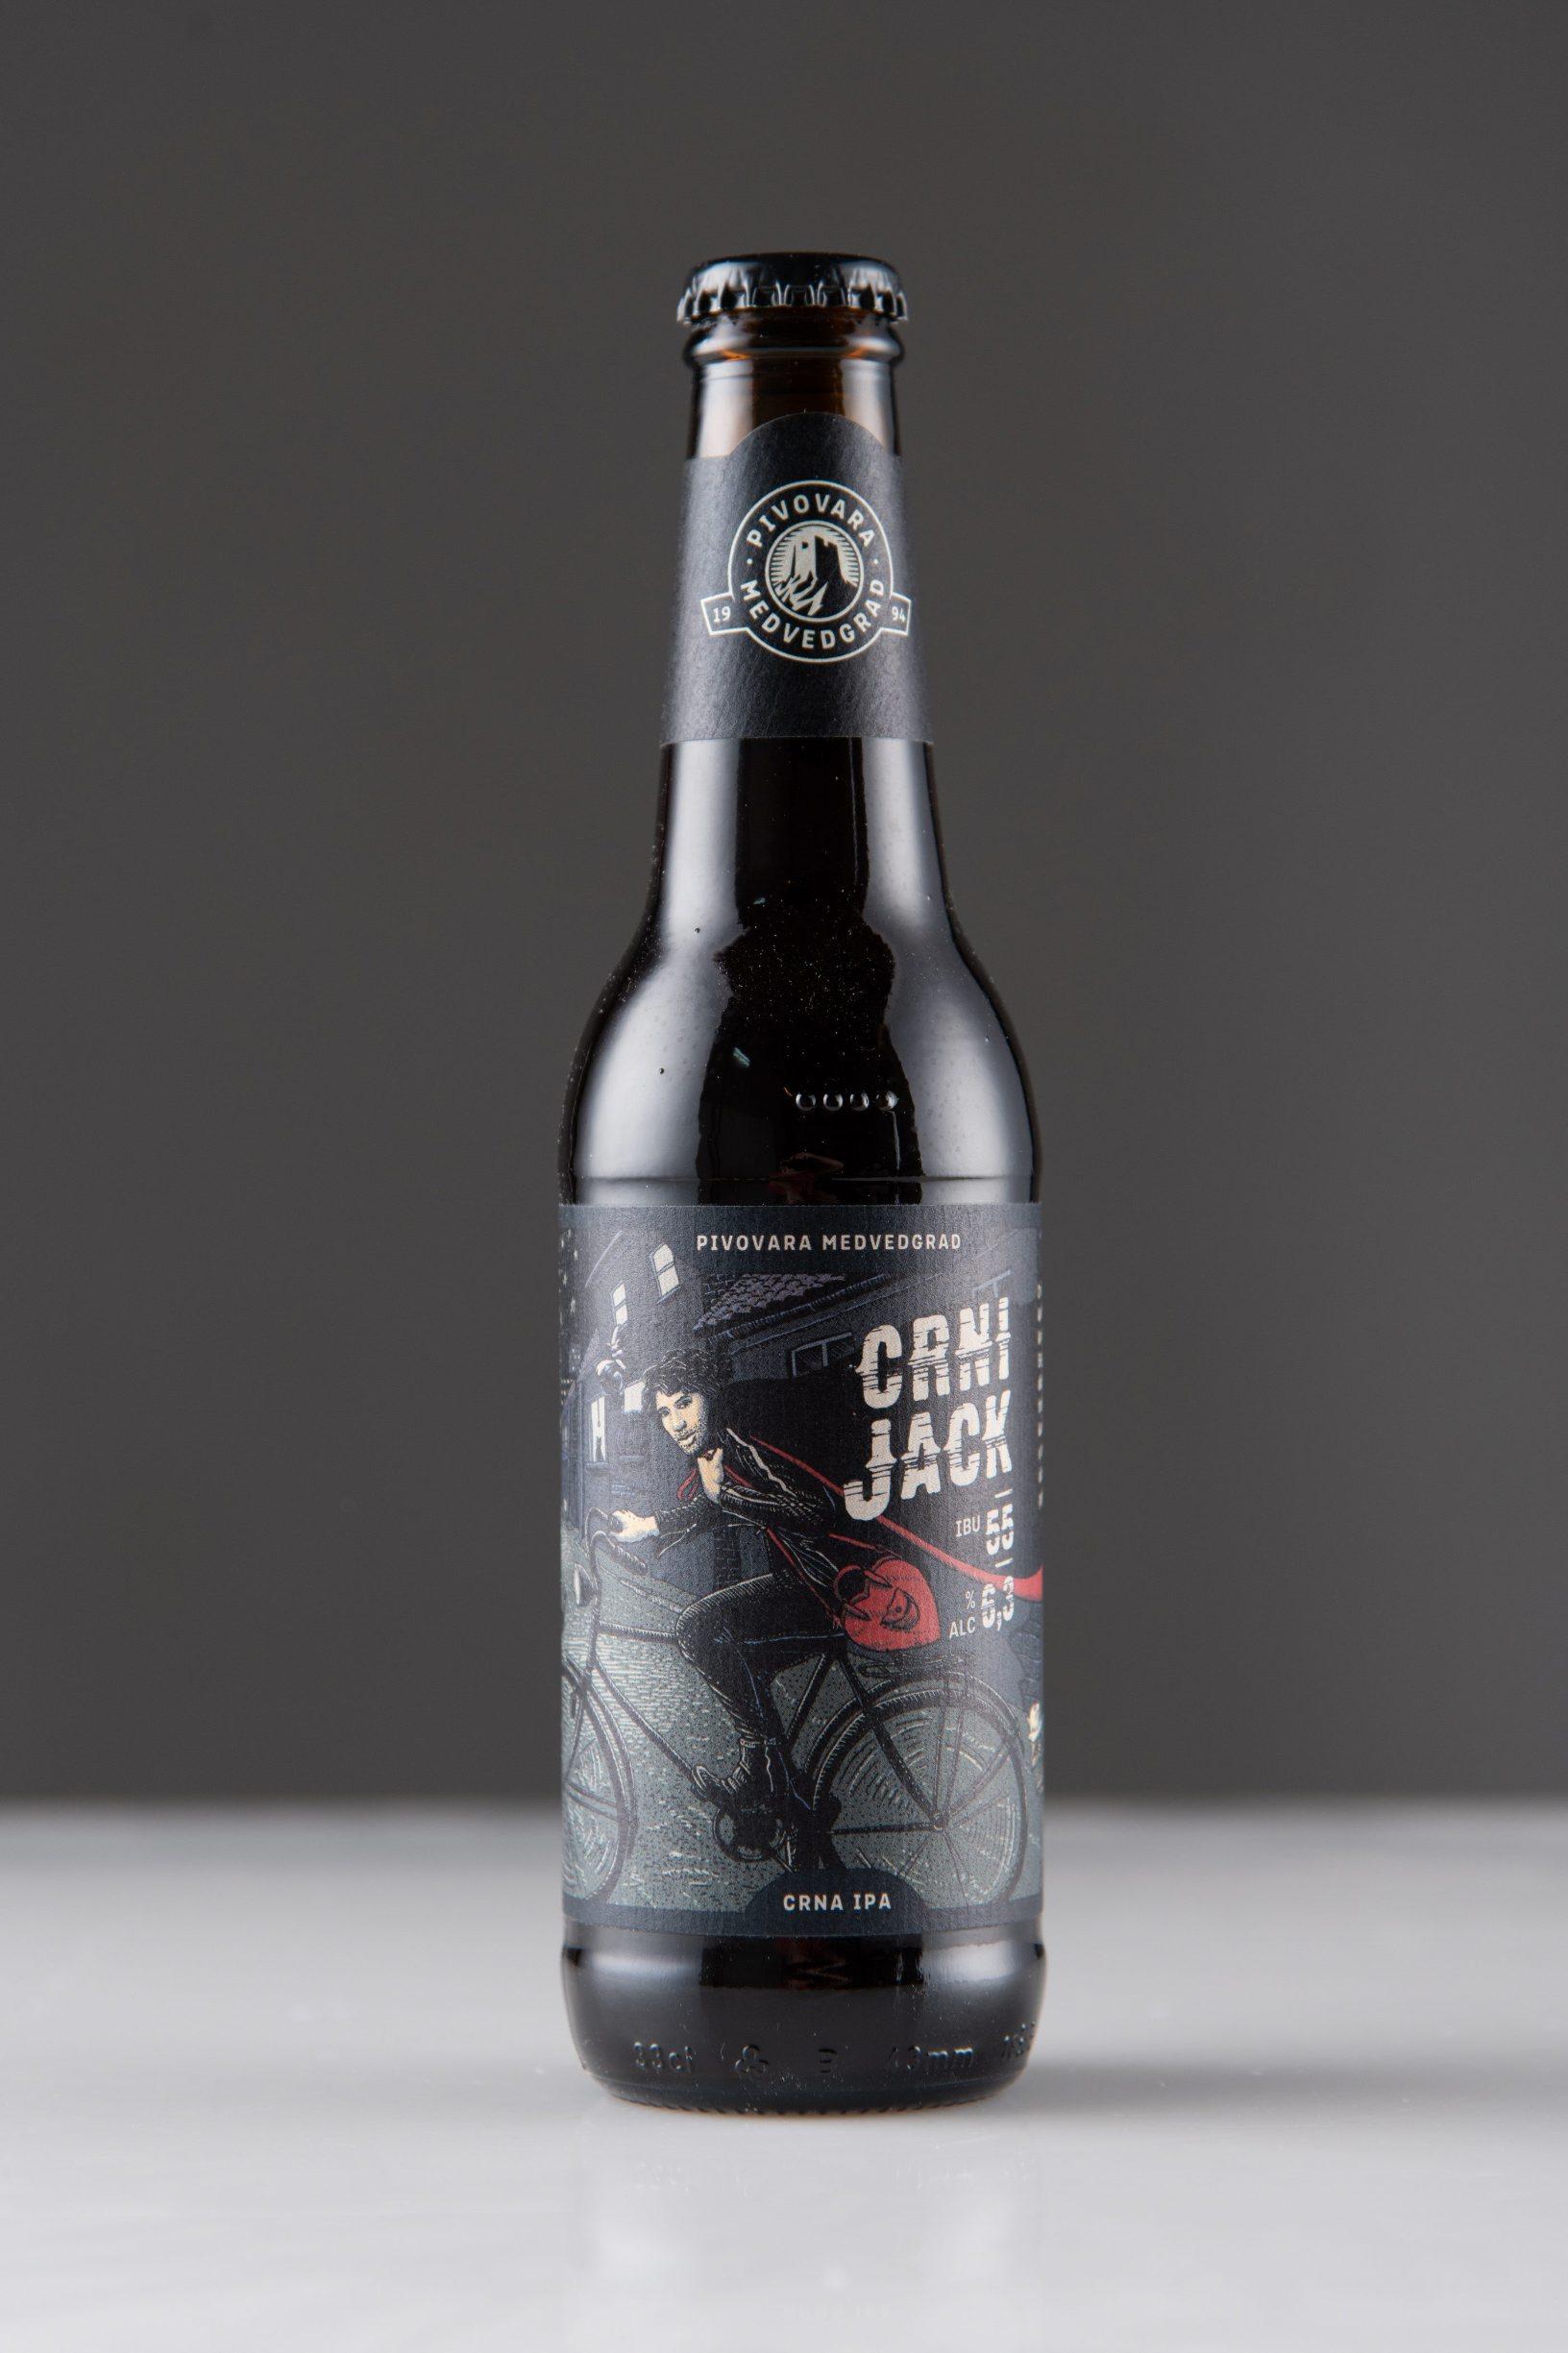 Zagreb, 241119 Test bozicnih tamnih piva. Na slici je: Crni jack pivo. Foto: Marko Miscevic / Cropix